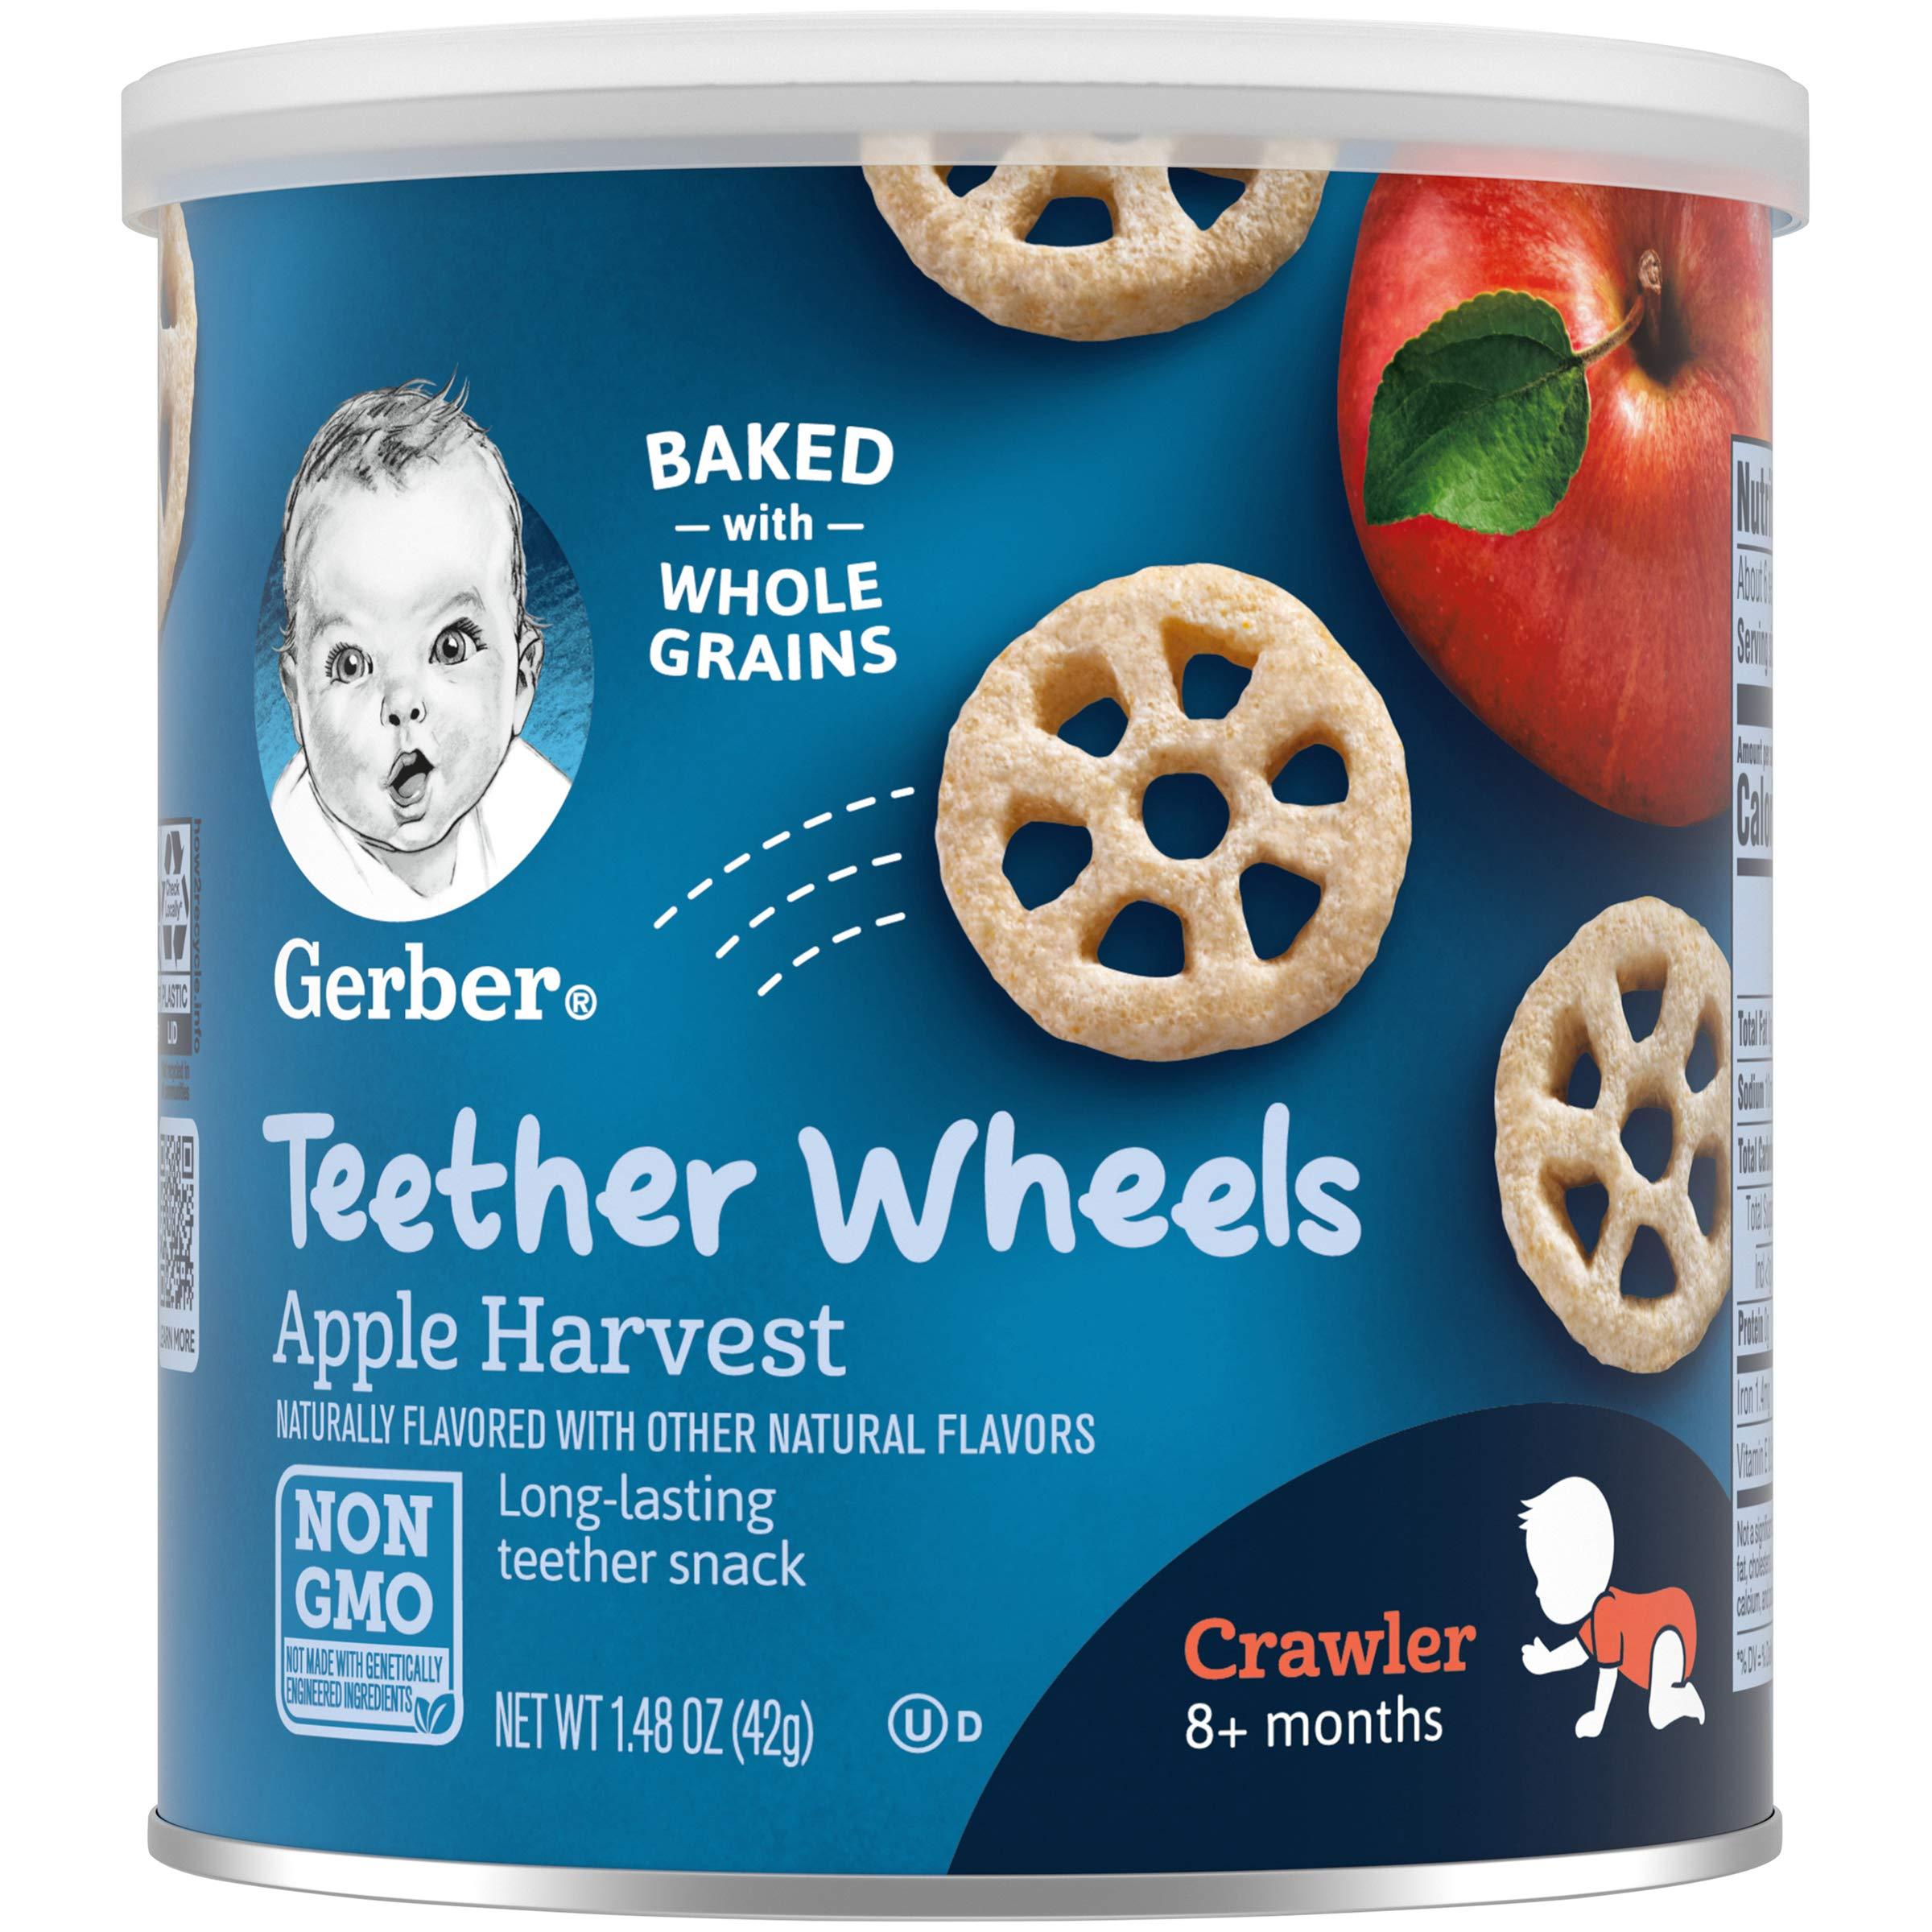 Gerber Teether Wheels, Apple Harvest, 1.48 Ounce (Pack of 6)